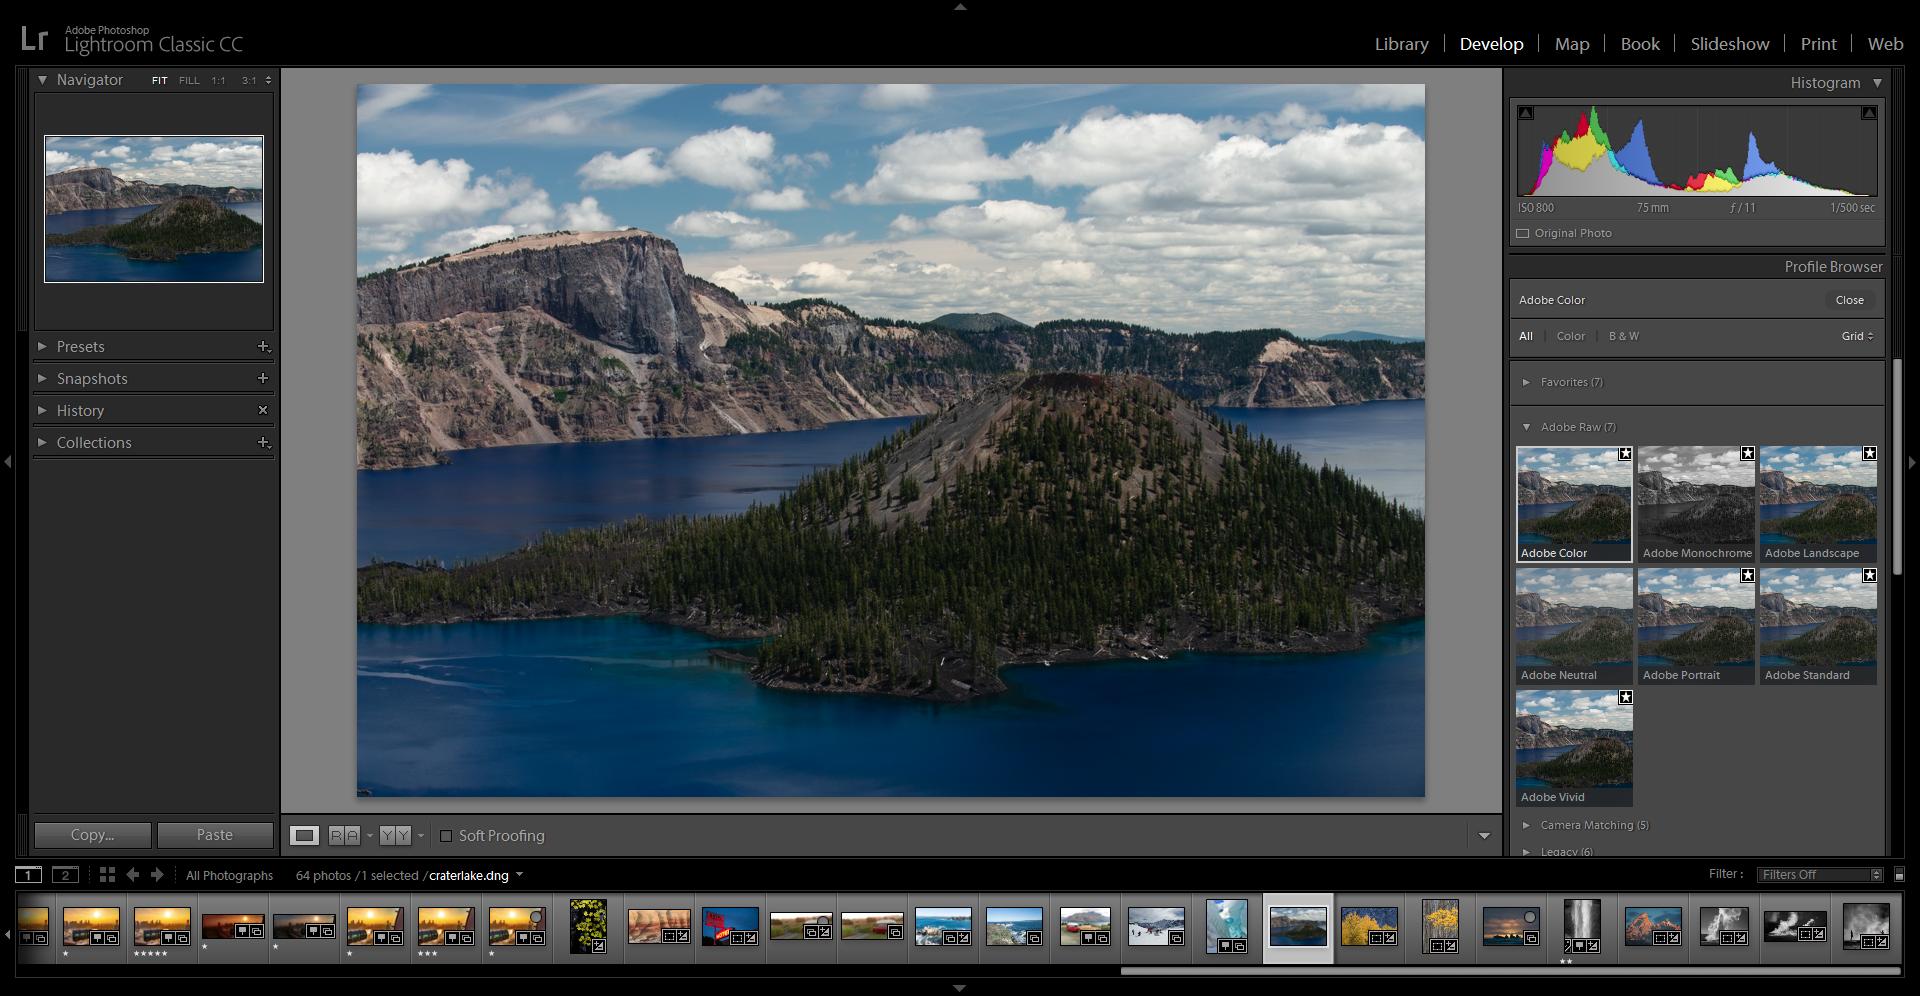 Adobe photoshop lightroom 5.7.1 full + keygen